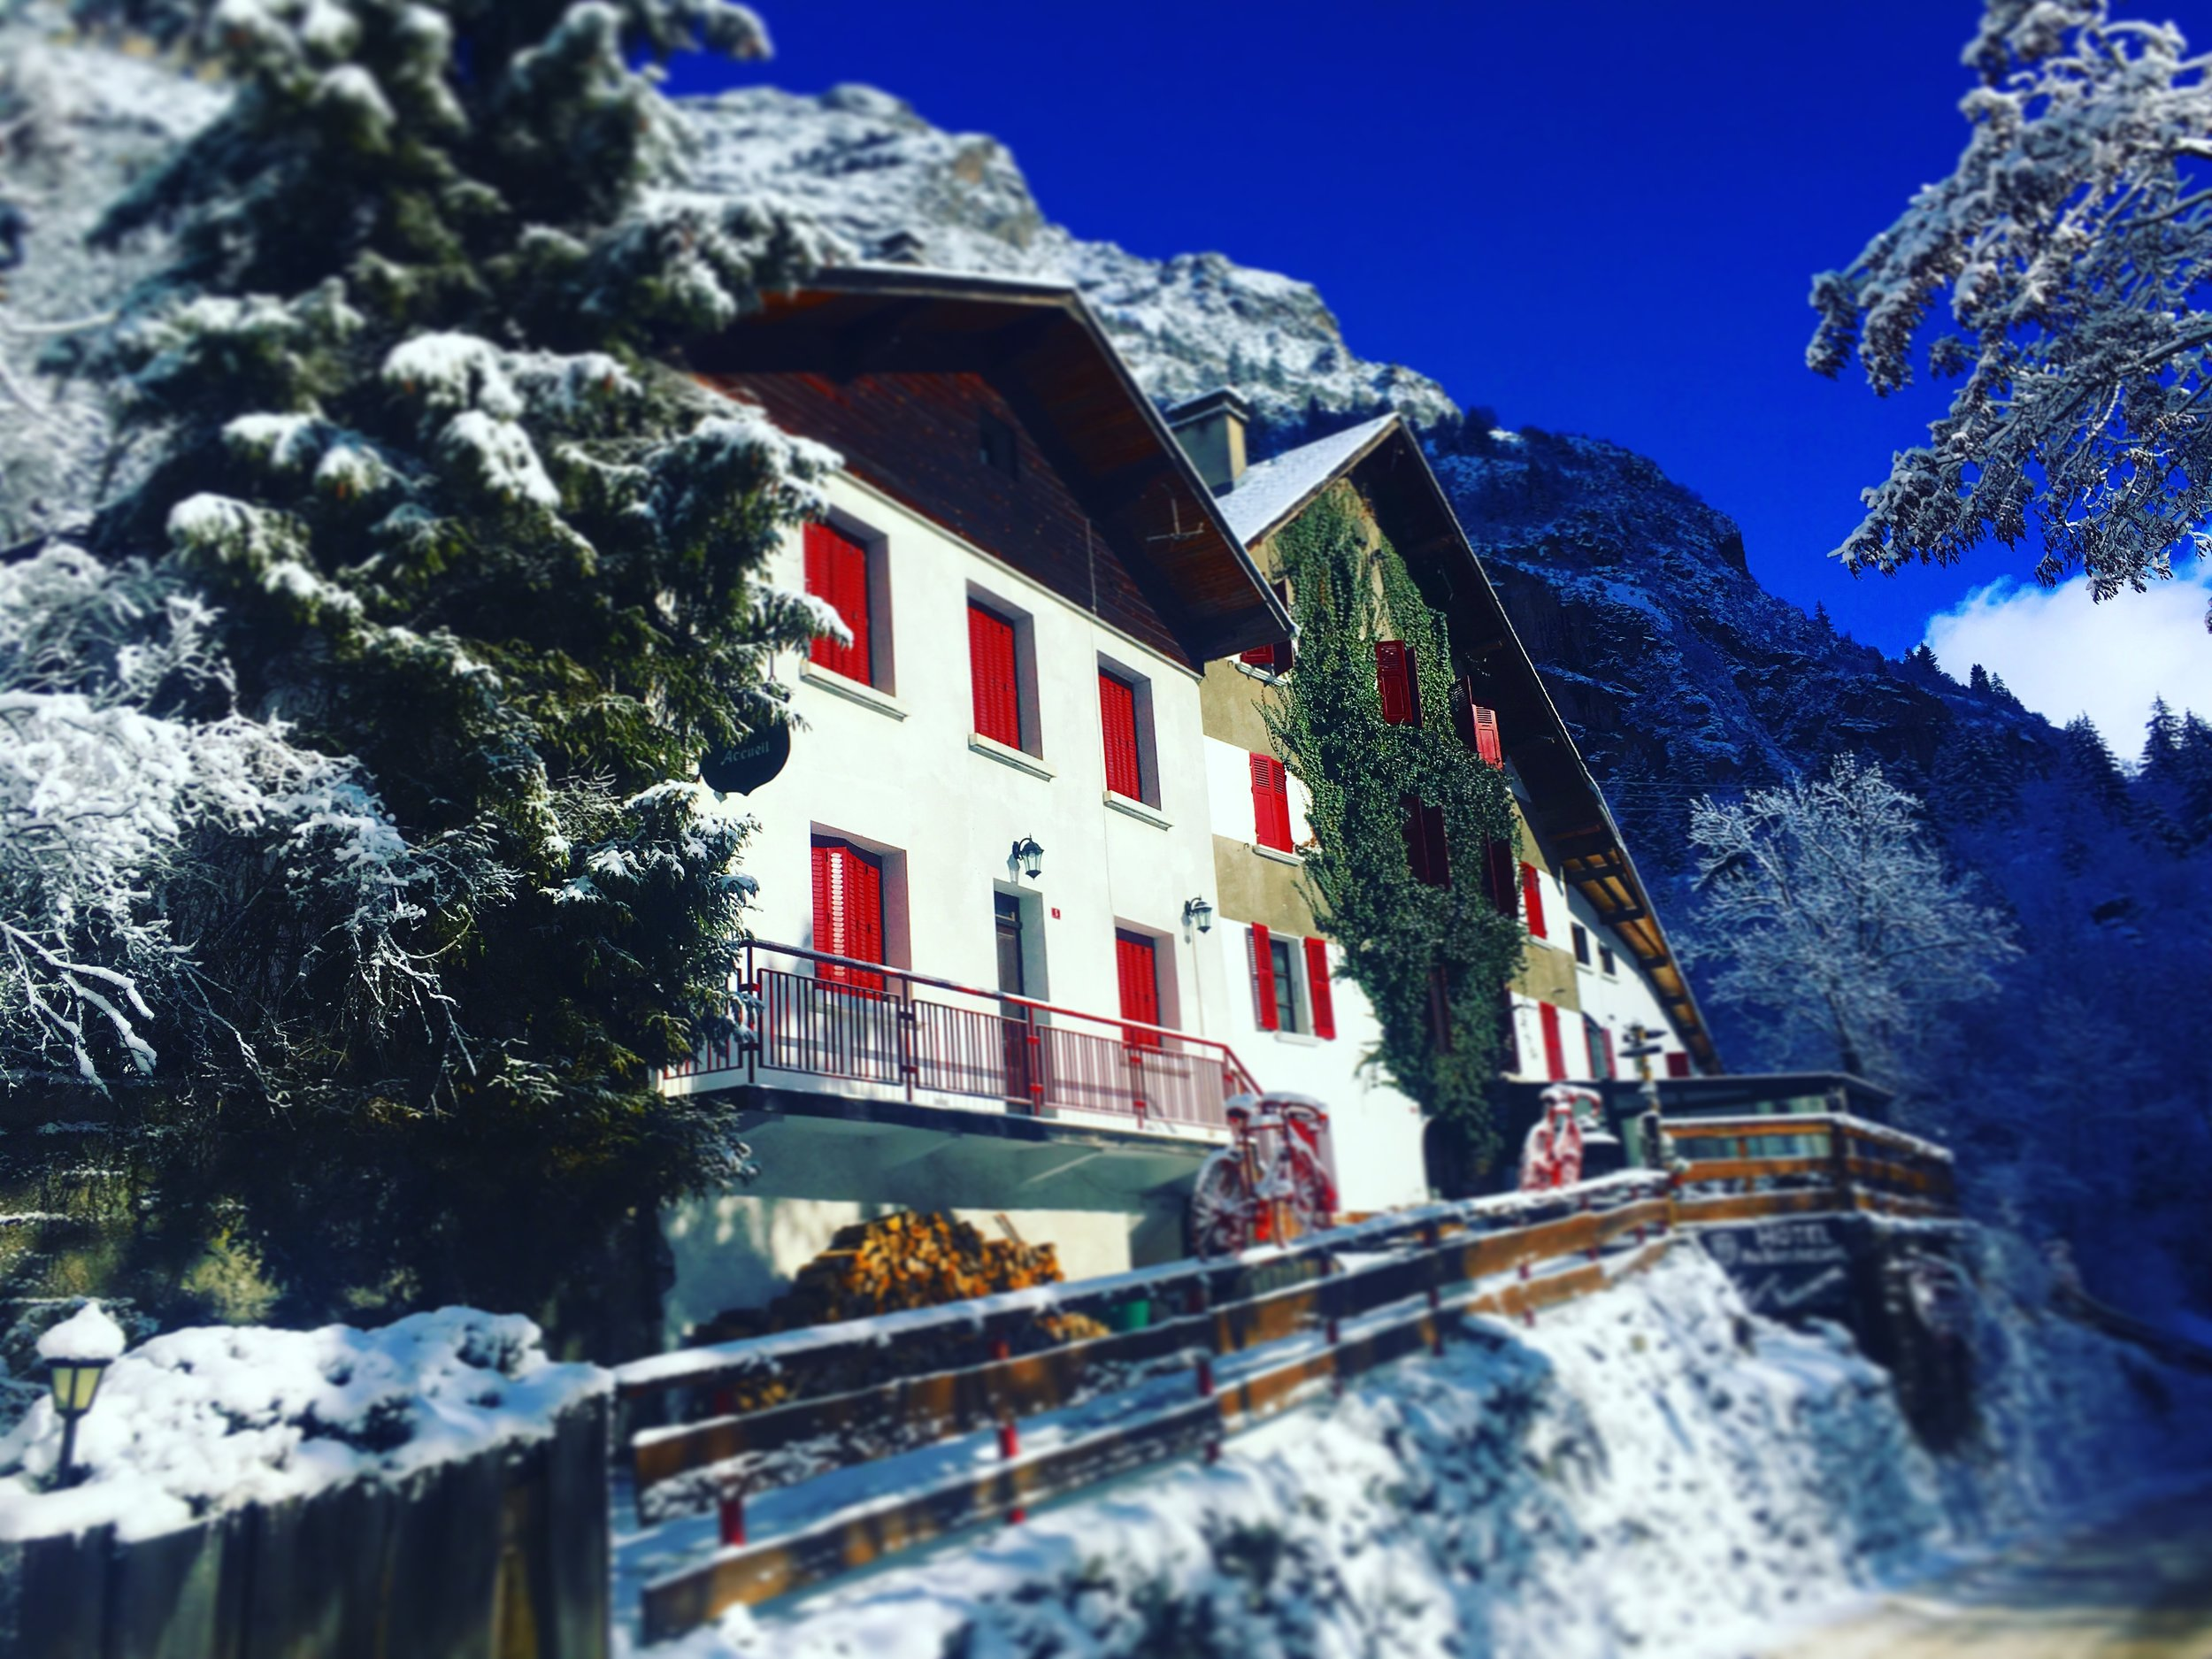 Hotel Au Bon Accueil   Hét hotel in de Franse Alpen    BEKIJK NU ONZE BESCHIKBAARHEID